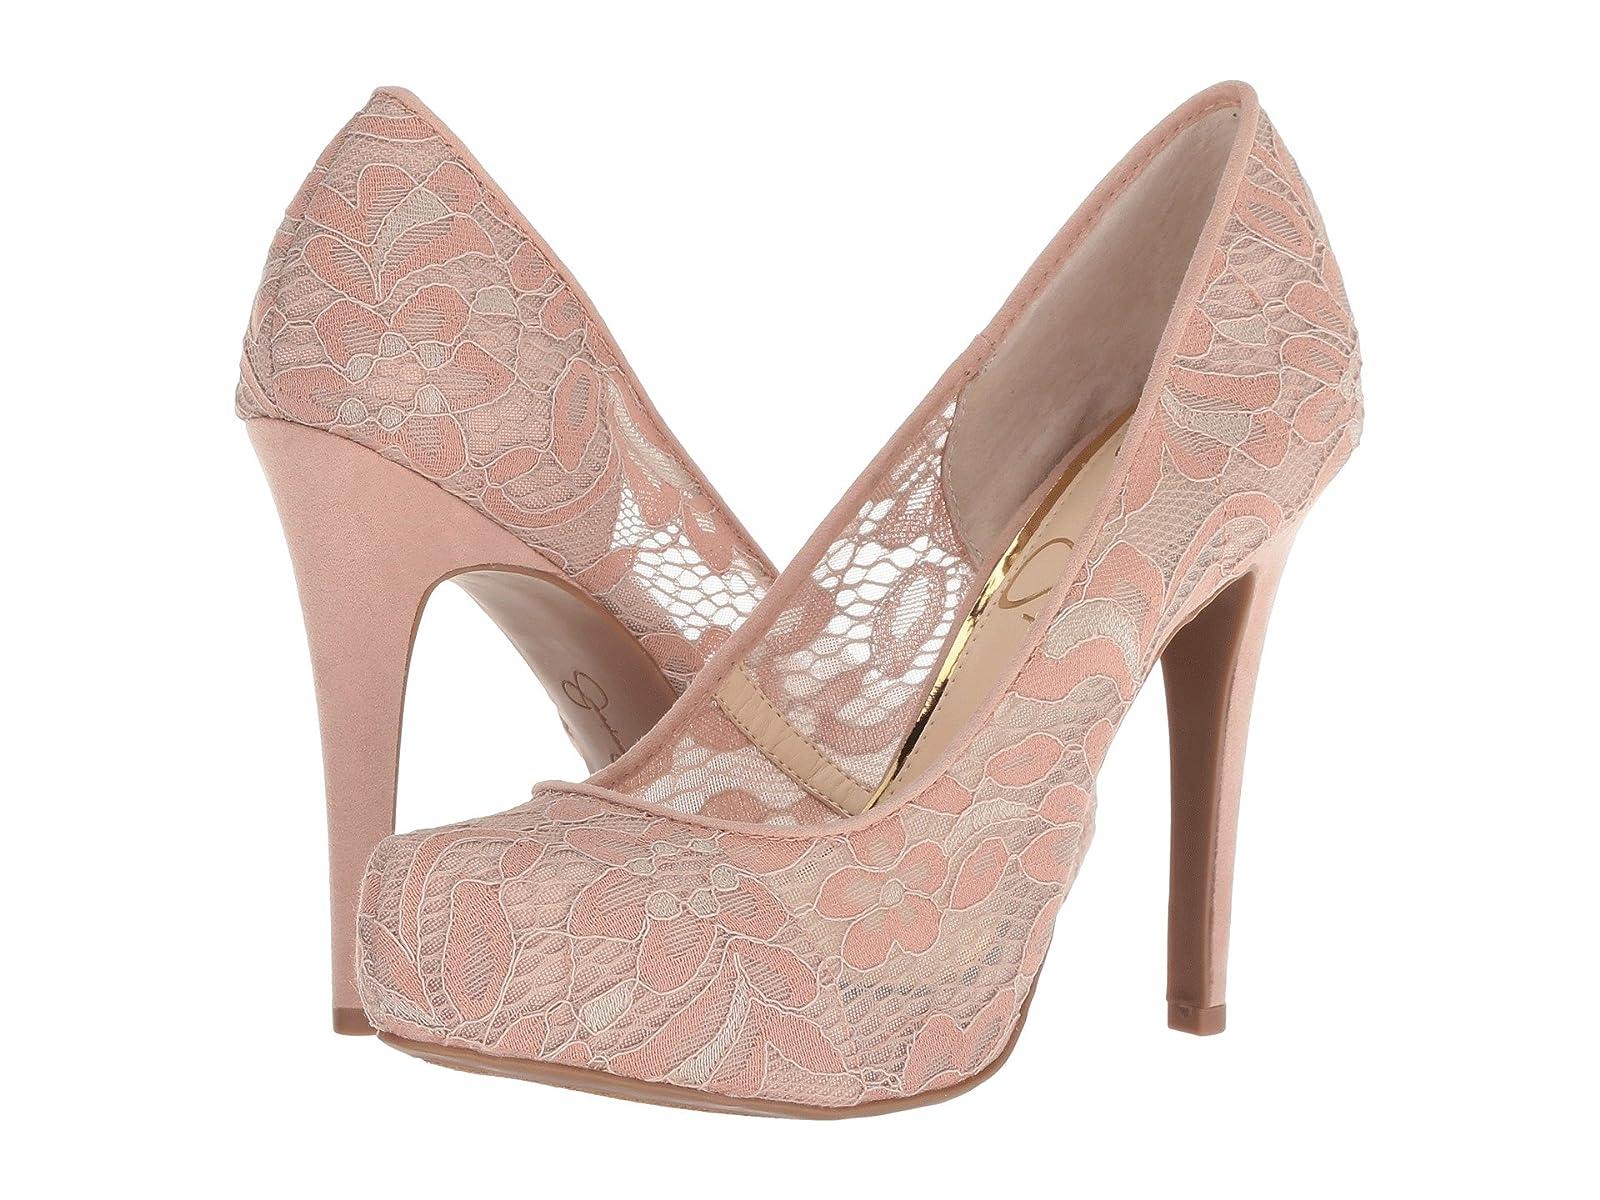 Jessica Simpson Parisah 3Atmospheric grades have affordable shoes